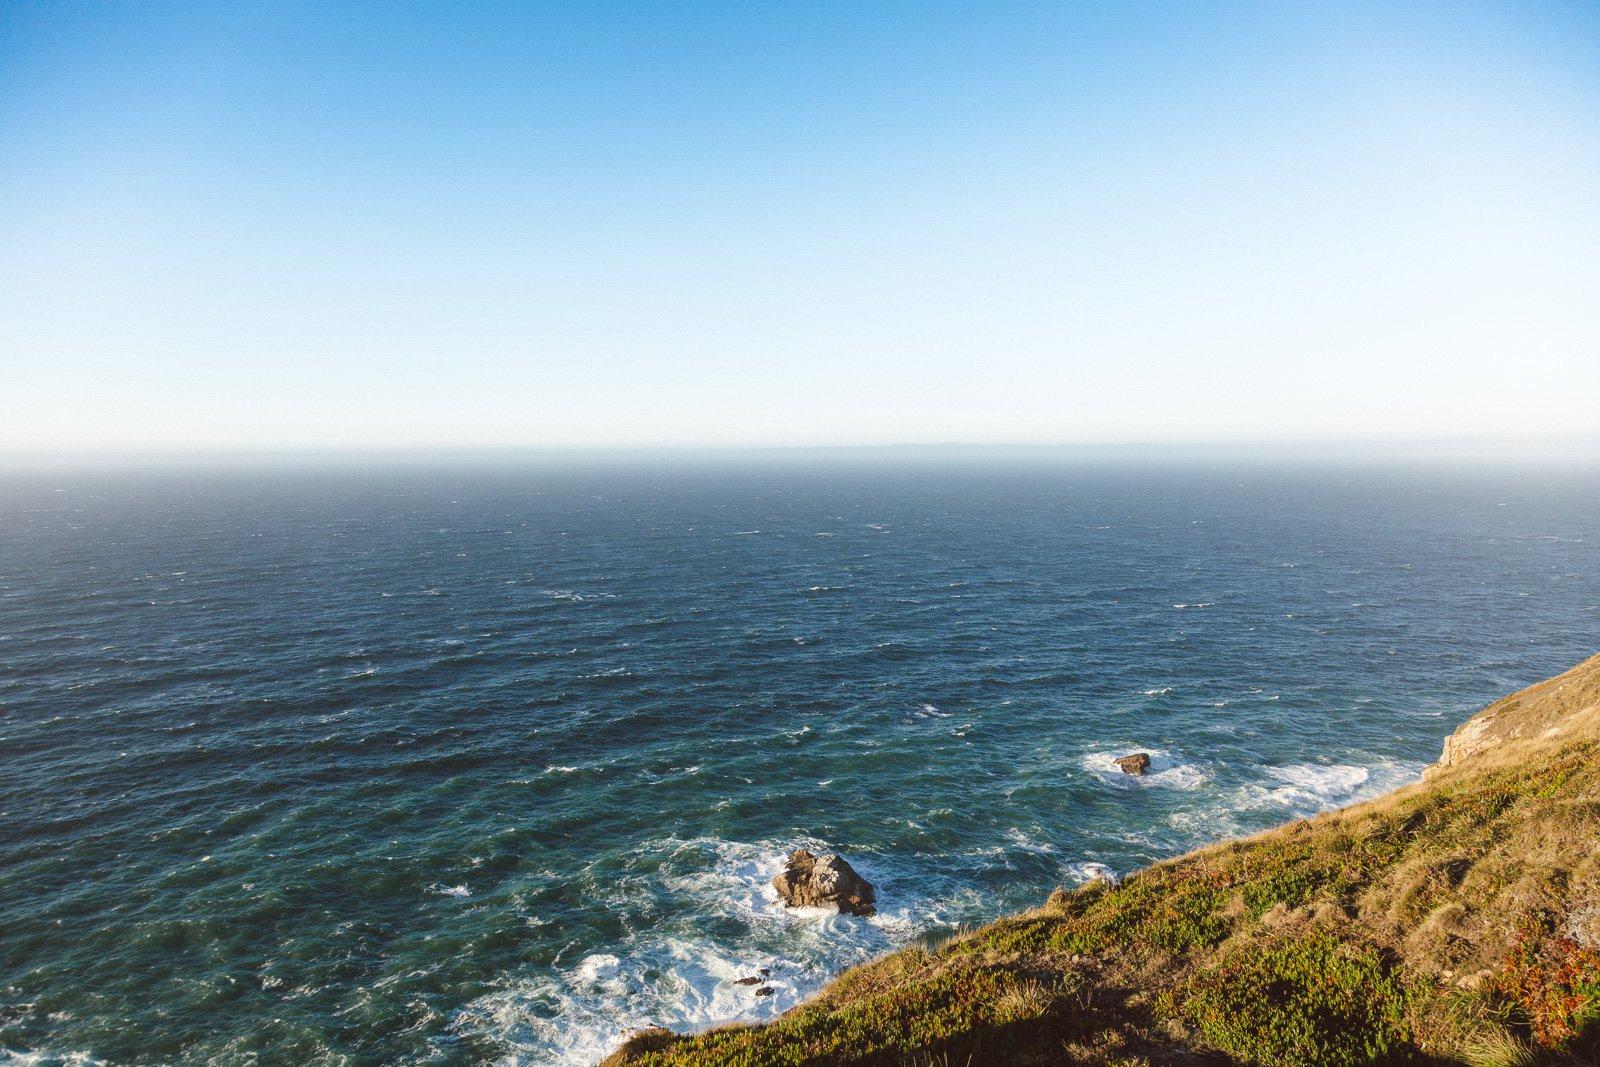 20131227_California_Coast_004.jpg